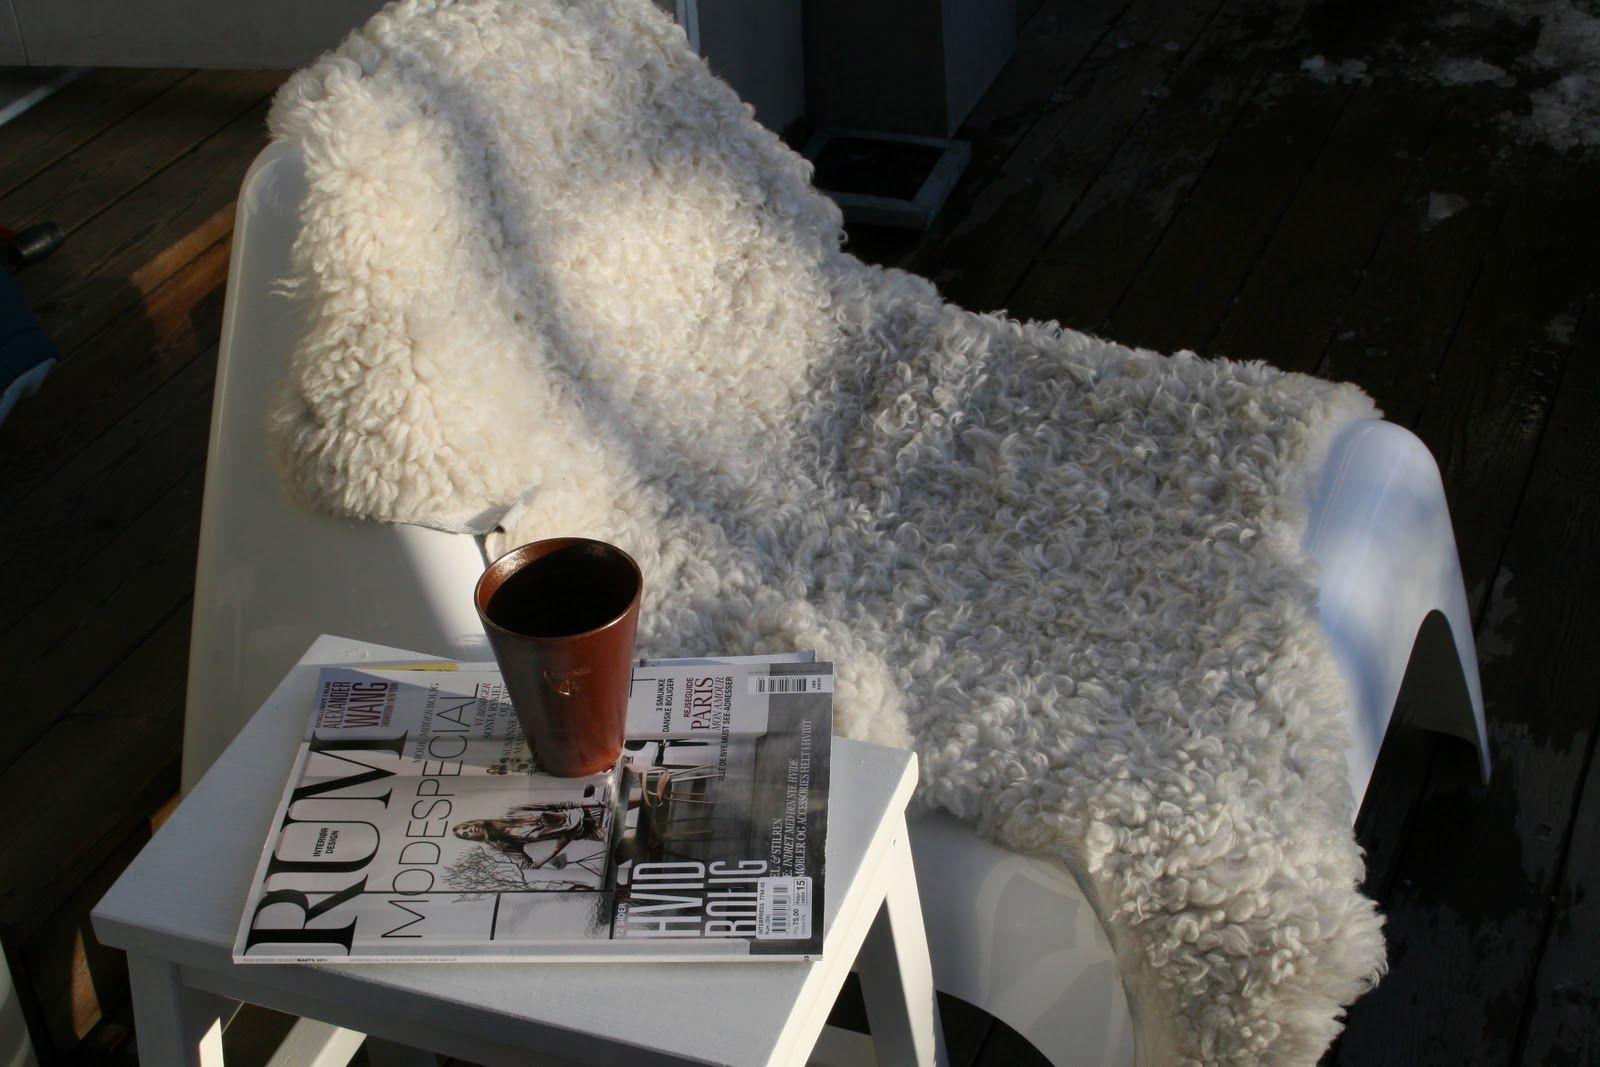 ikea ps v g sessel weiss garden pinterest ikea ps. Black Bedroom Furniture Sets. Home Design Ideas